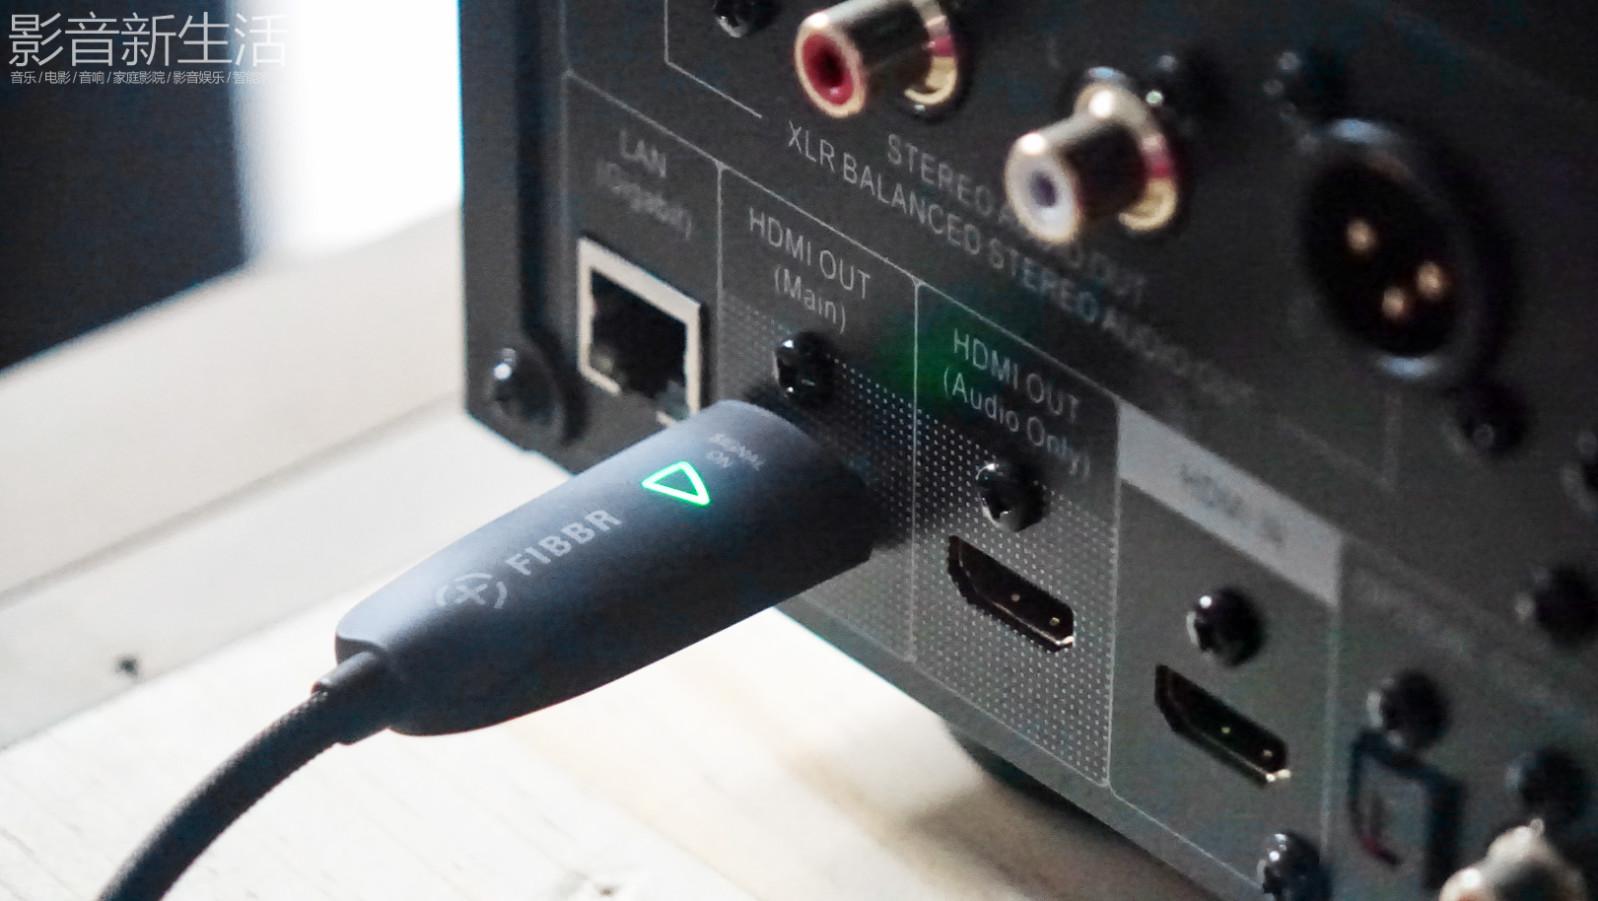 "fibbr pro hdmi 9 - 推荐 | ""衰减率低、可弯折、耐用度高,高品质的HDMI线""FIBBR Ultra Pro 光纤HDMI线"